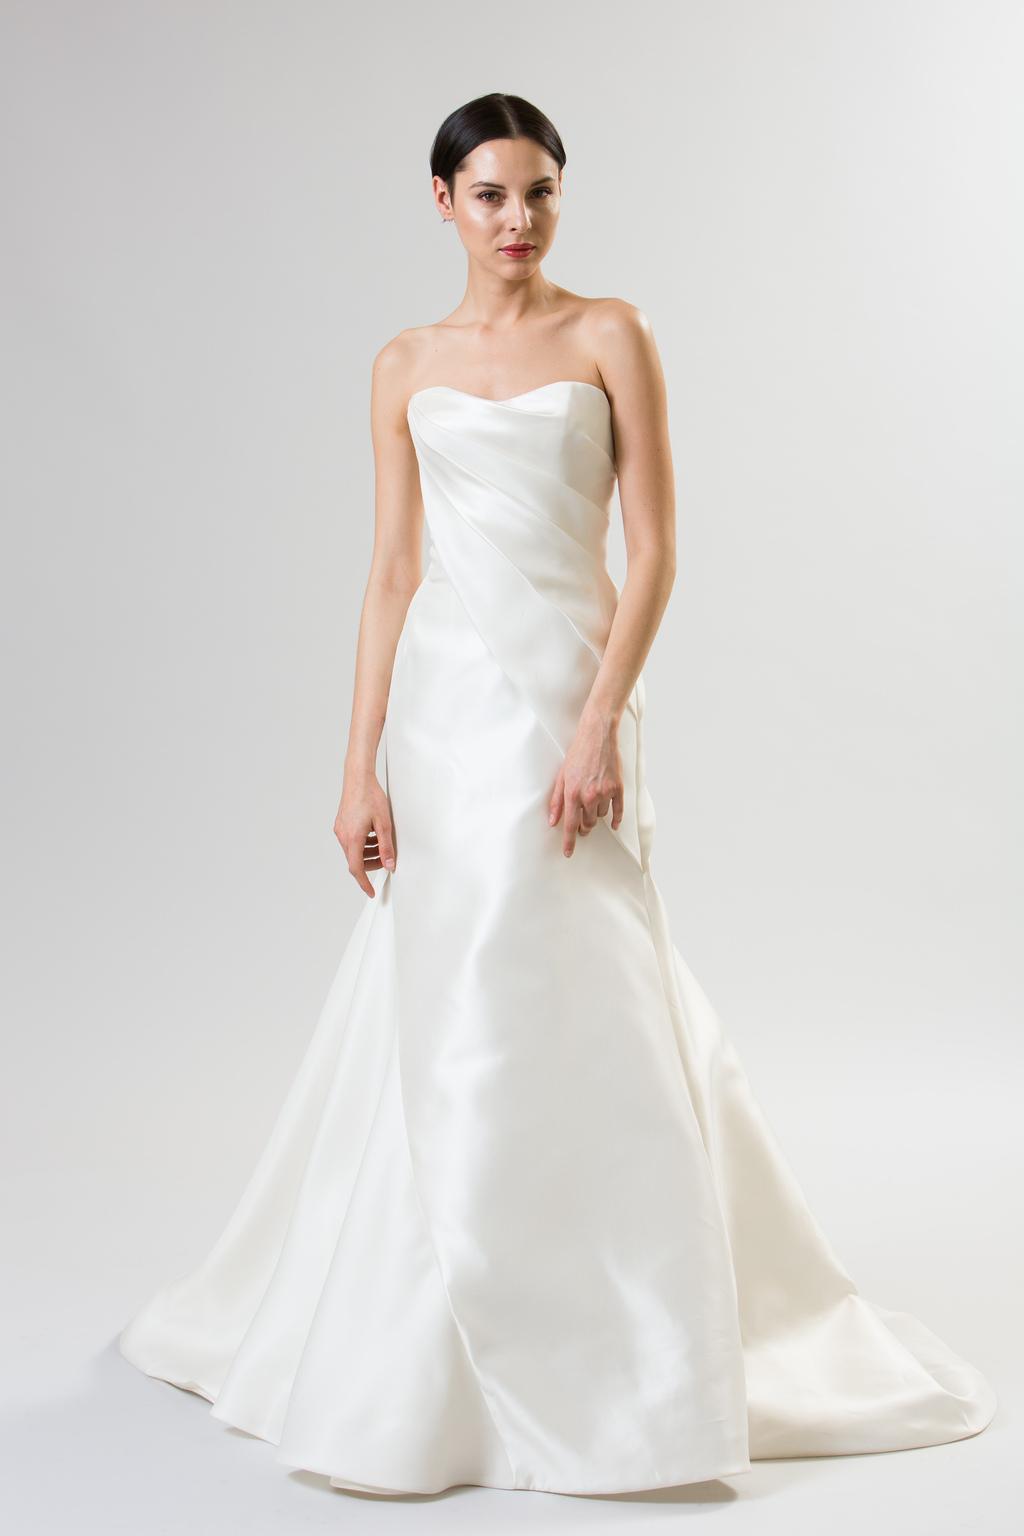 Junko-yoshioka-summer-spring-2014-wedding-dress-eclair_1.full